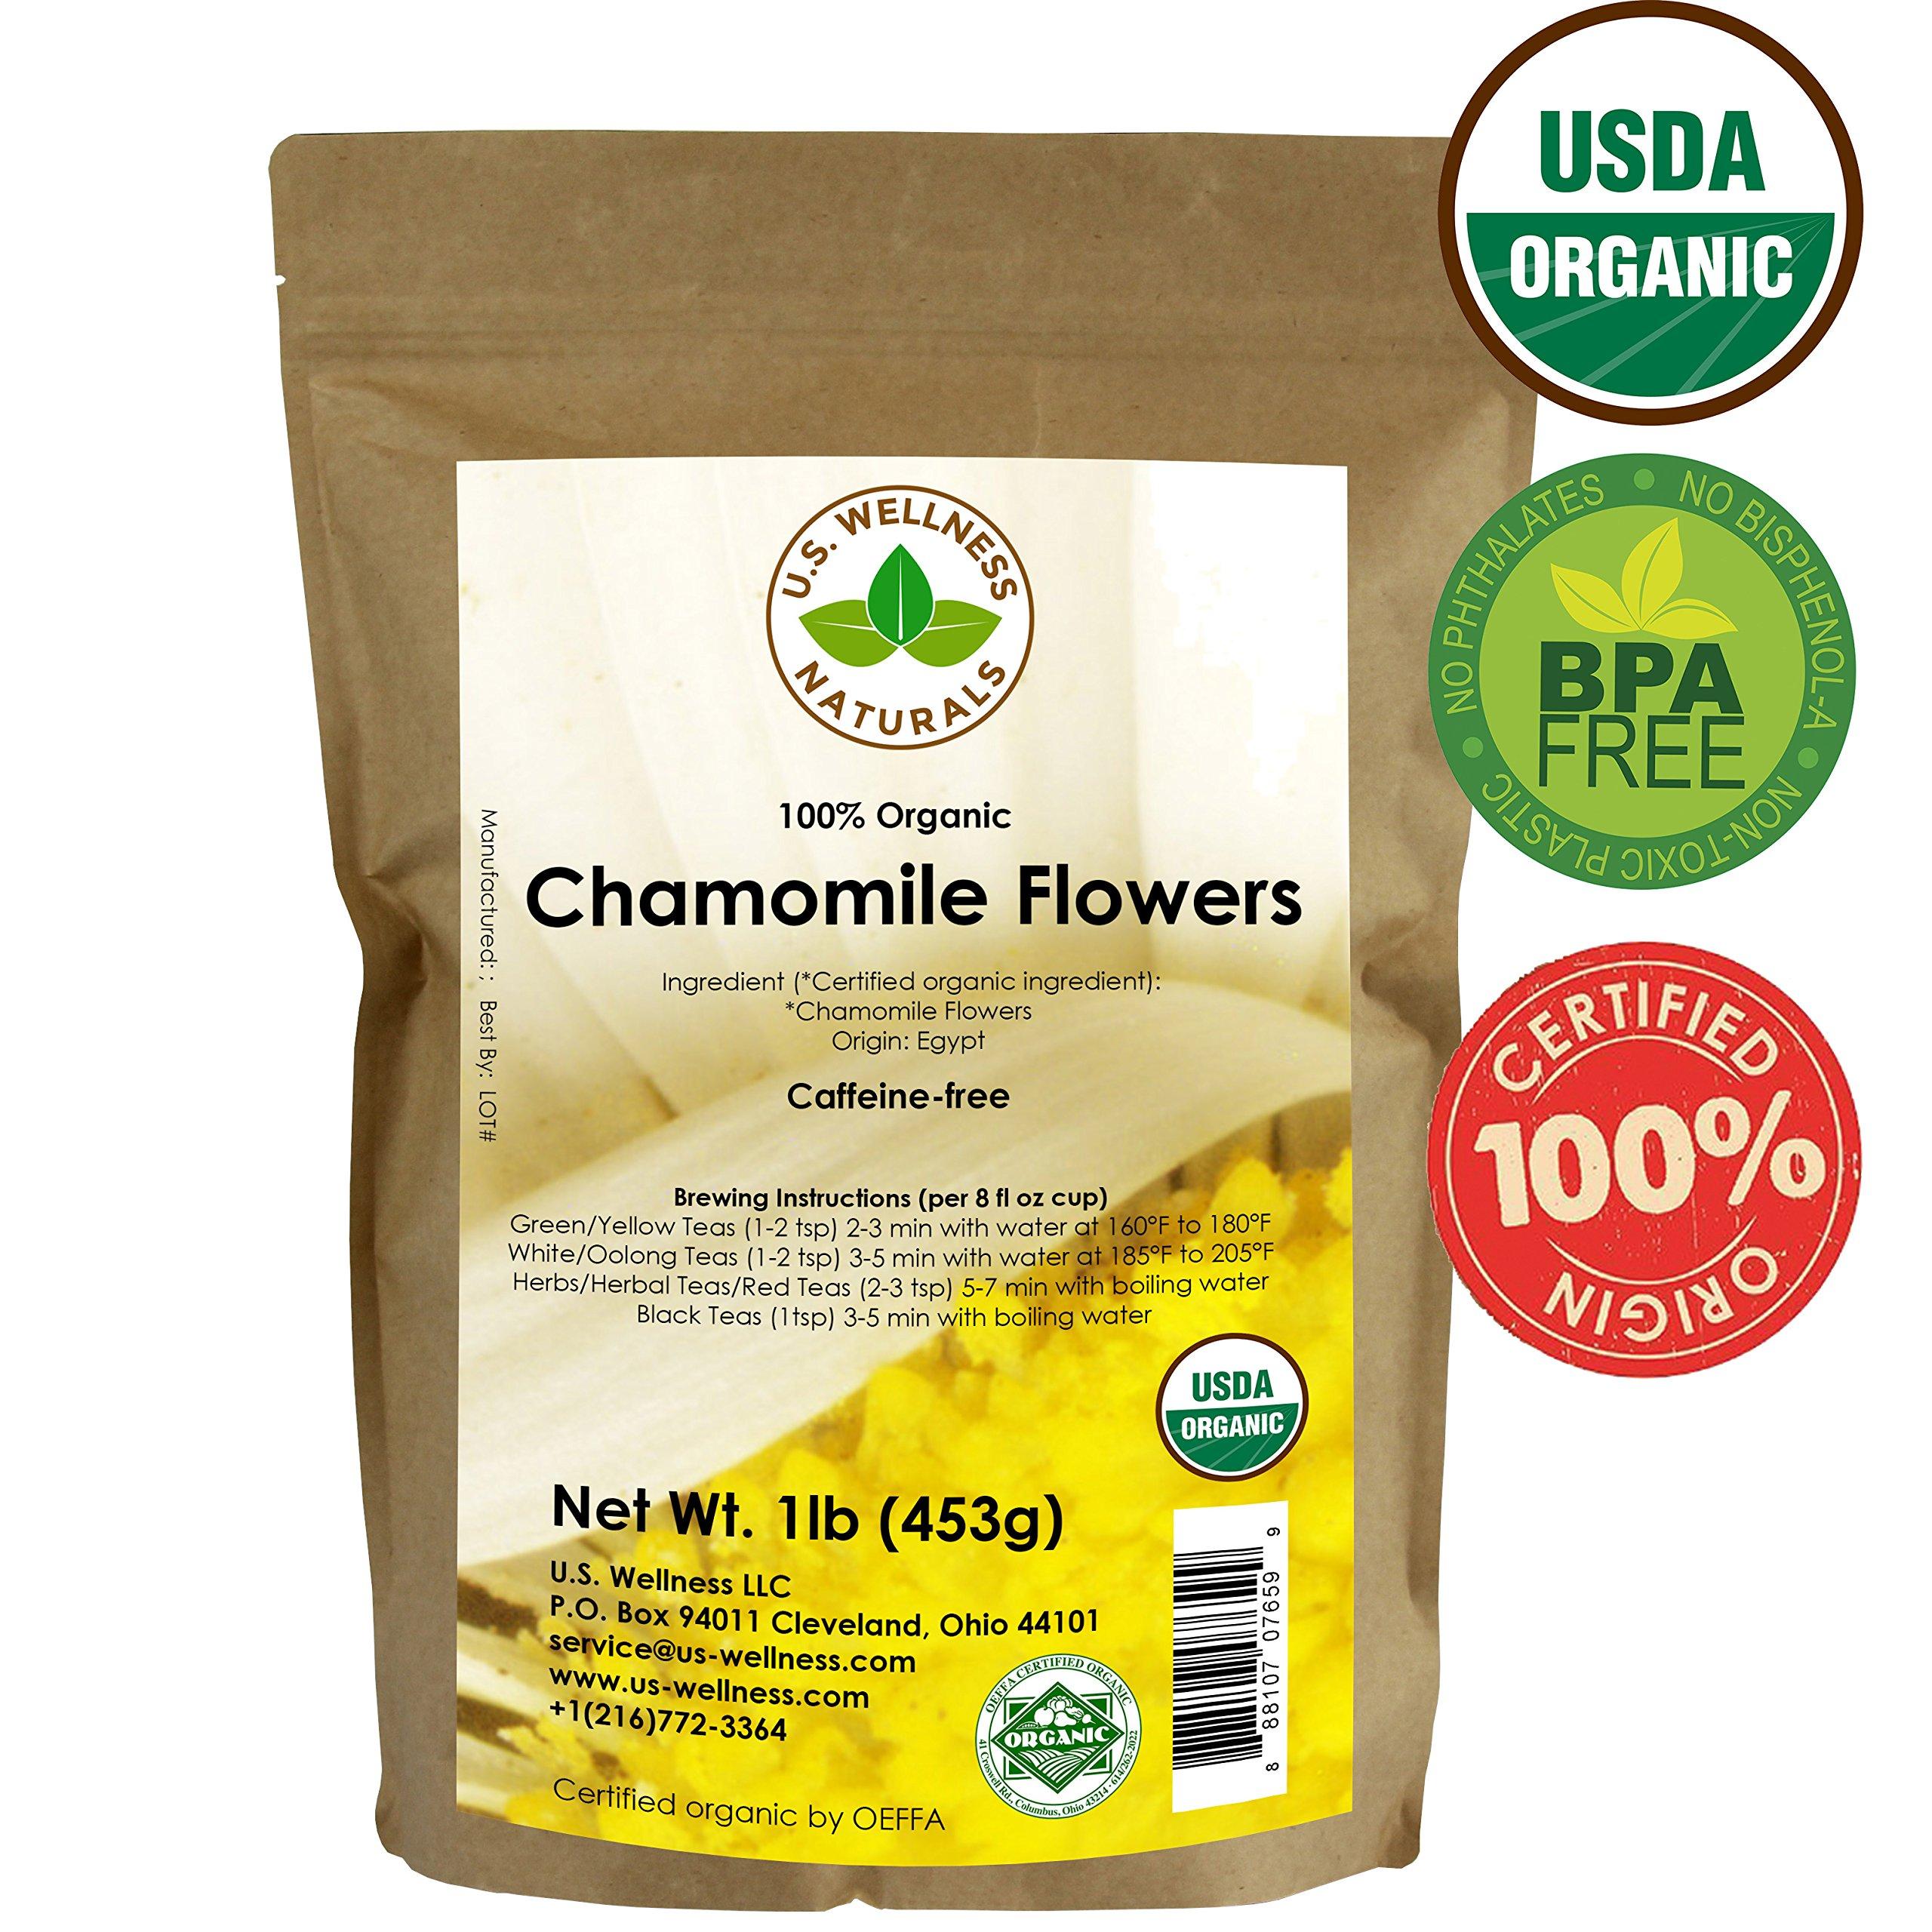 Chamomile Tea 1LB (16Oz) 100% CERTIFIED Organic (USDA seal) Chamomile Flowers Herbal Tea (Matricaria Chamomilla) in 1 lb Bulk Kraft BPA free Resealable Bags from U.S. Wellness